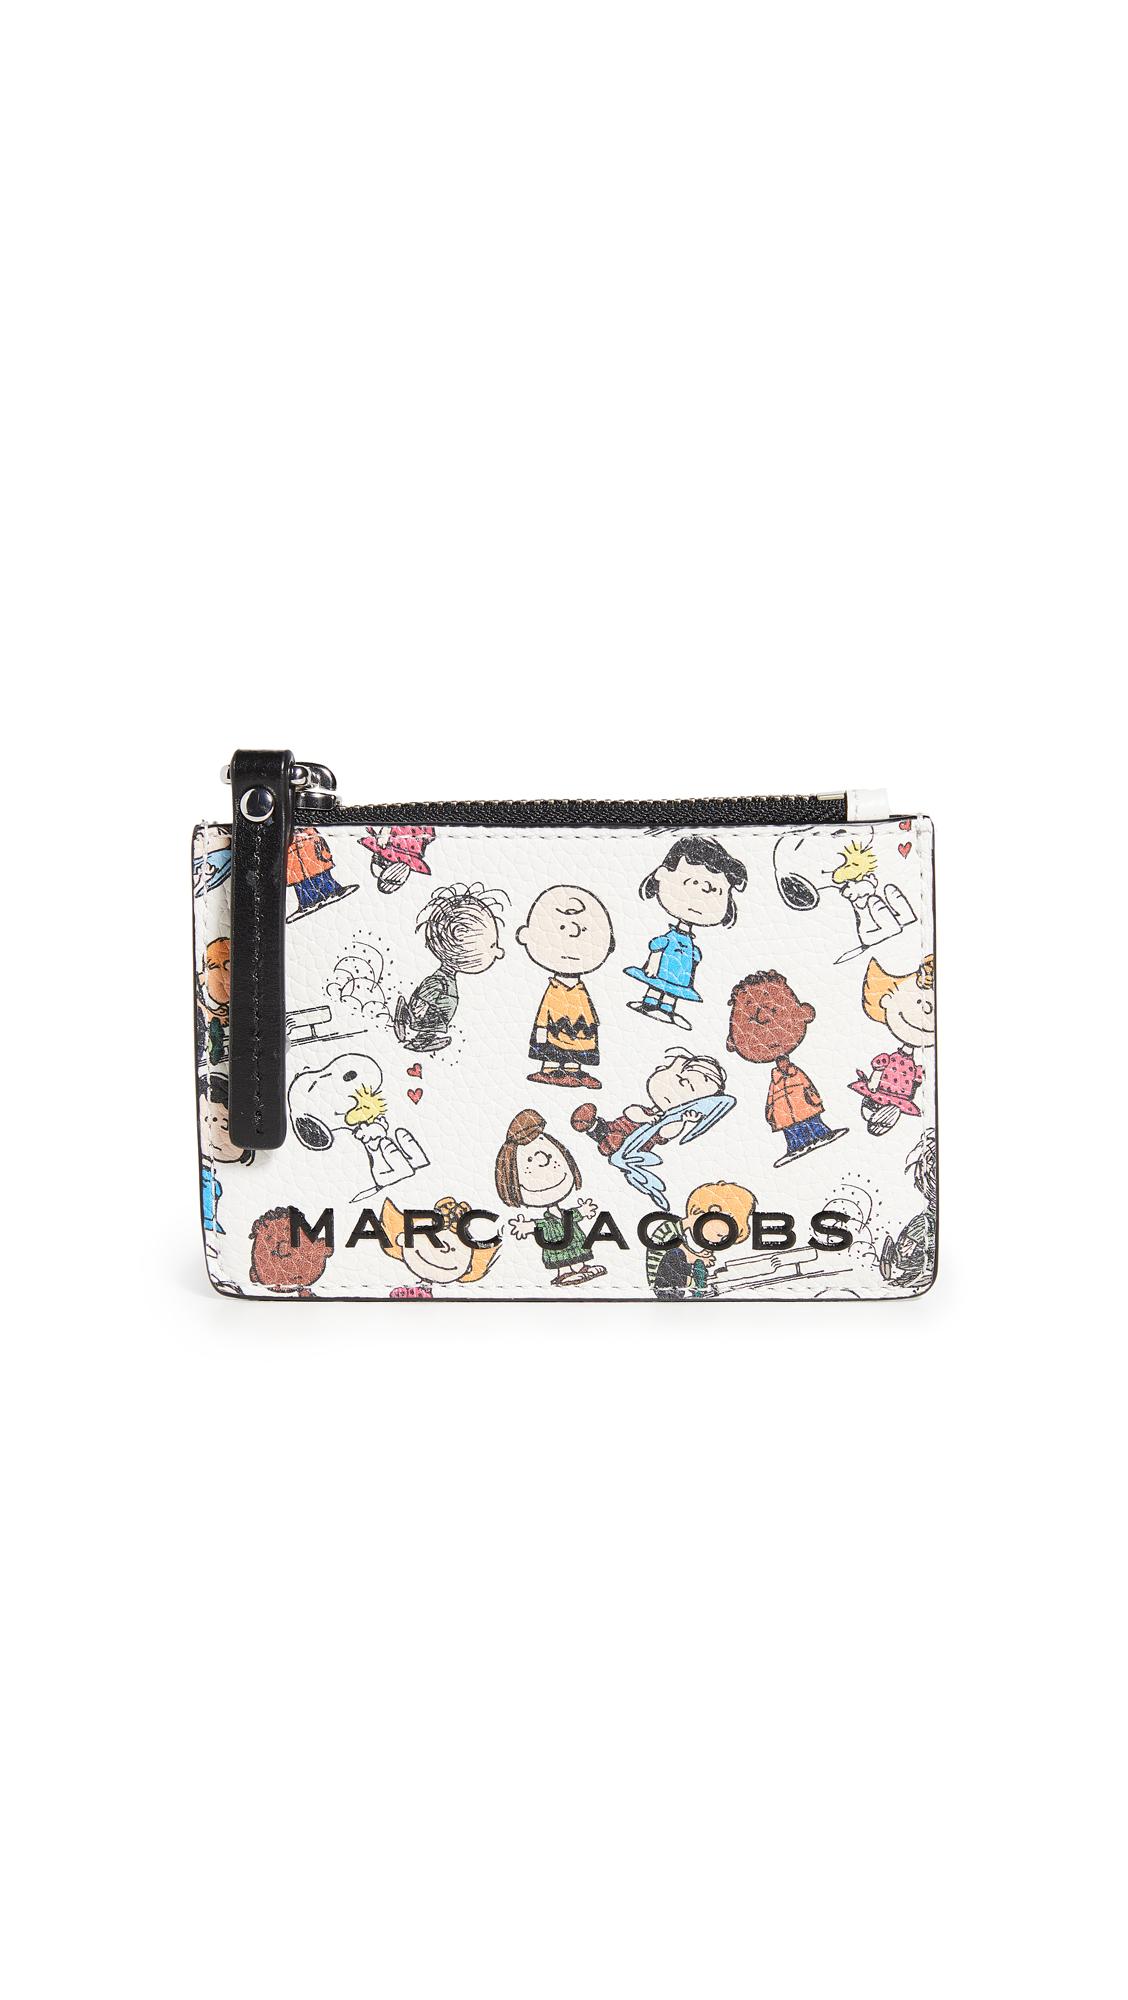 The Marc Jacobs x Peanuts Top Zip Multi Wallet